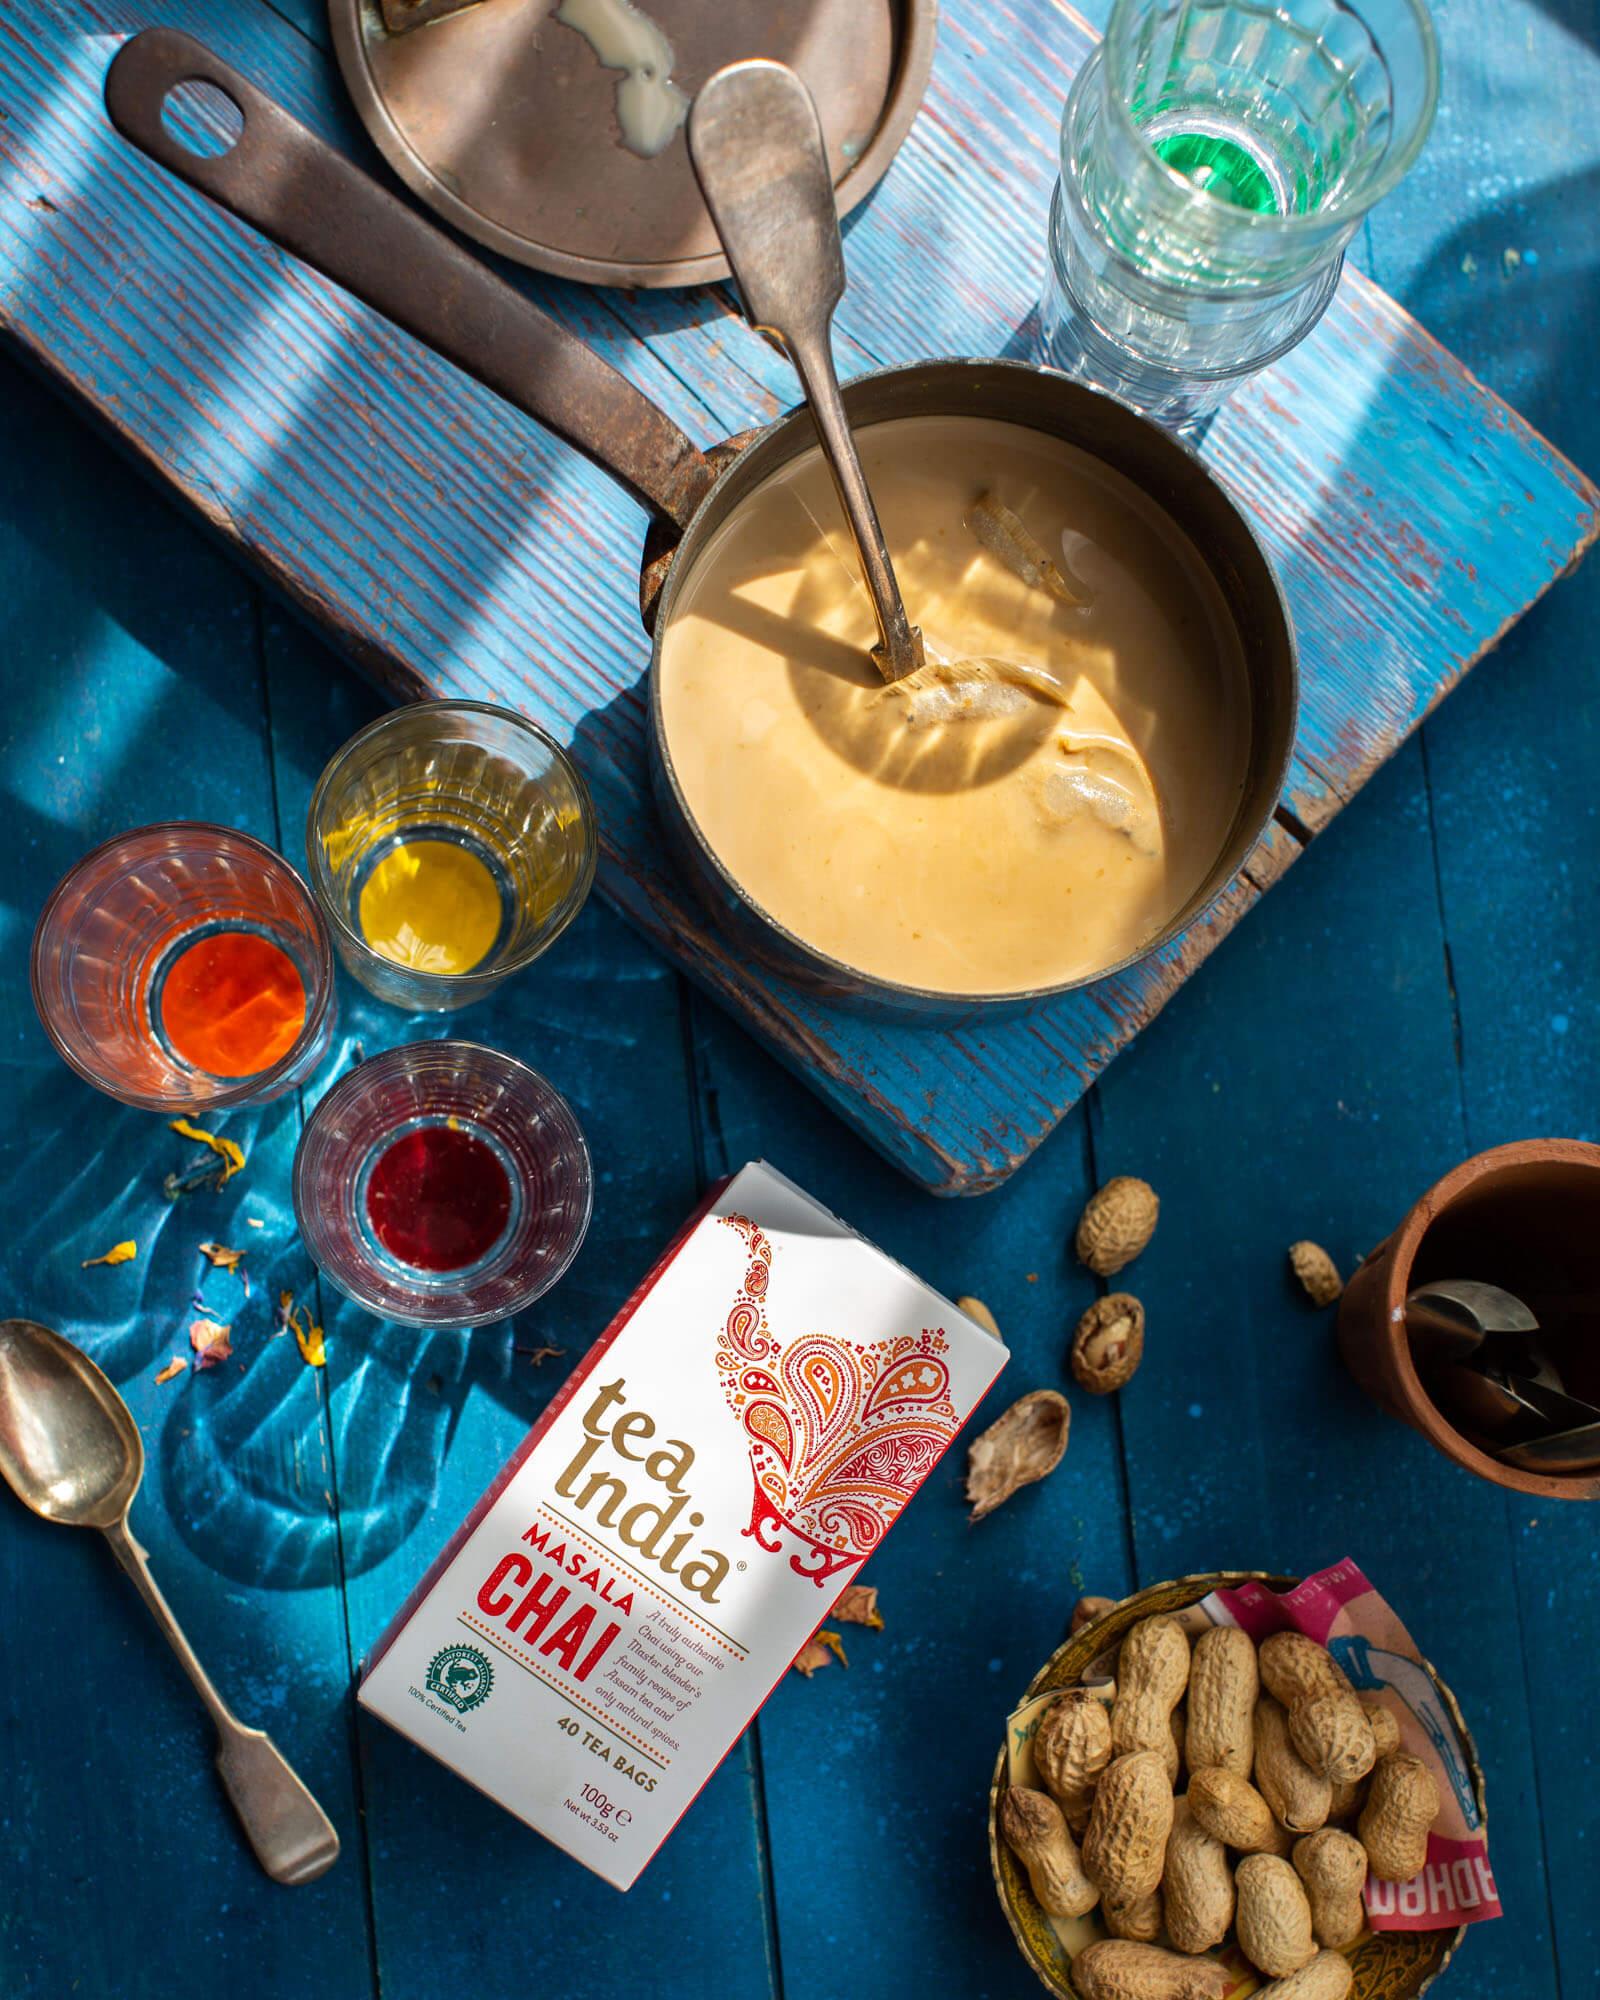 Tea India - chai Tea - Drink photography-Lara Jane Thorpe